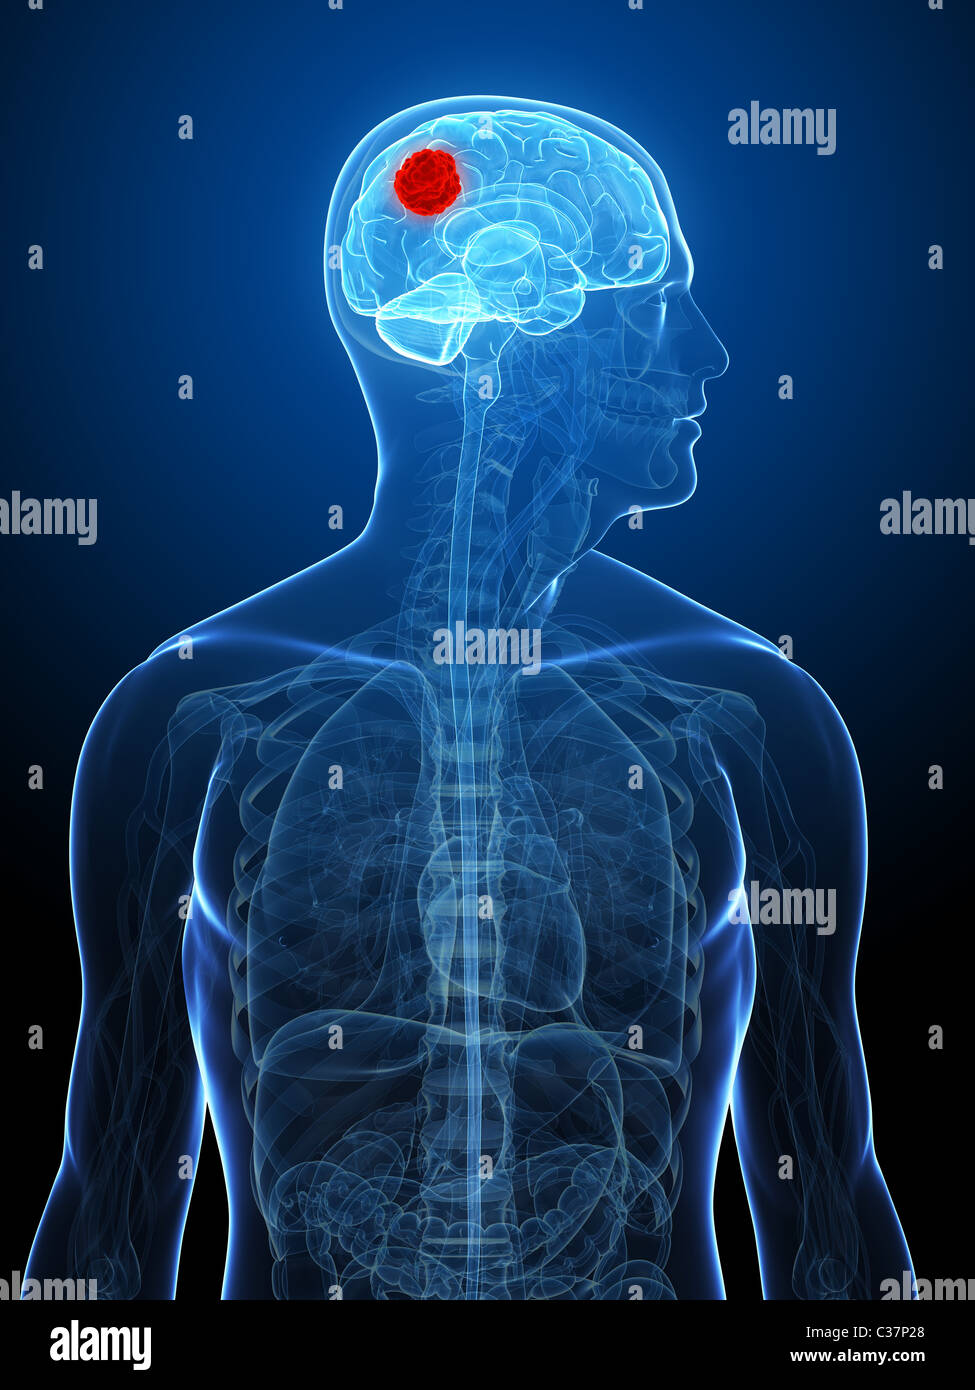 Brain Tumor Scan Stockfotos & Brain Tumor Scan Bilder - Alamy